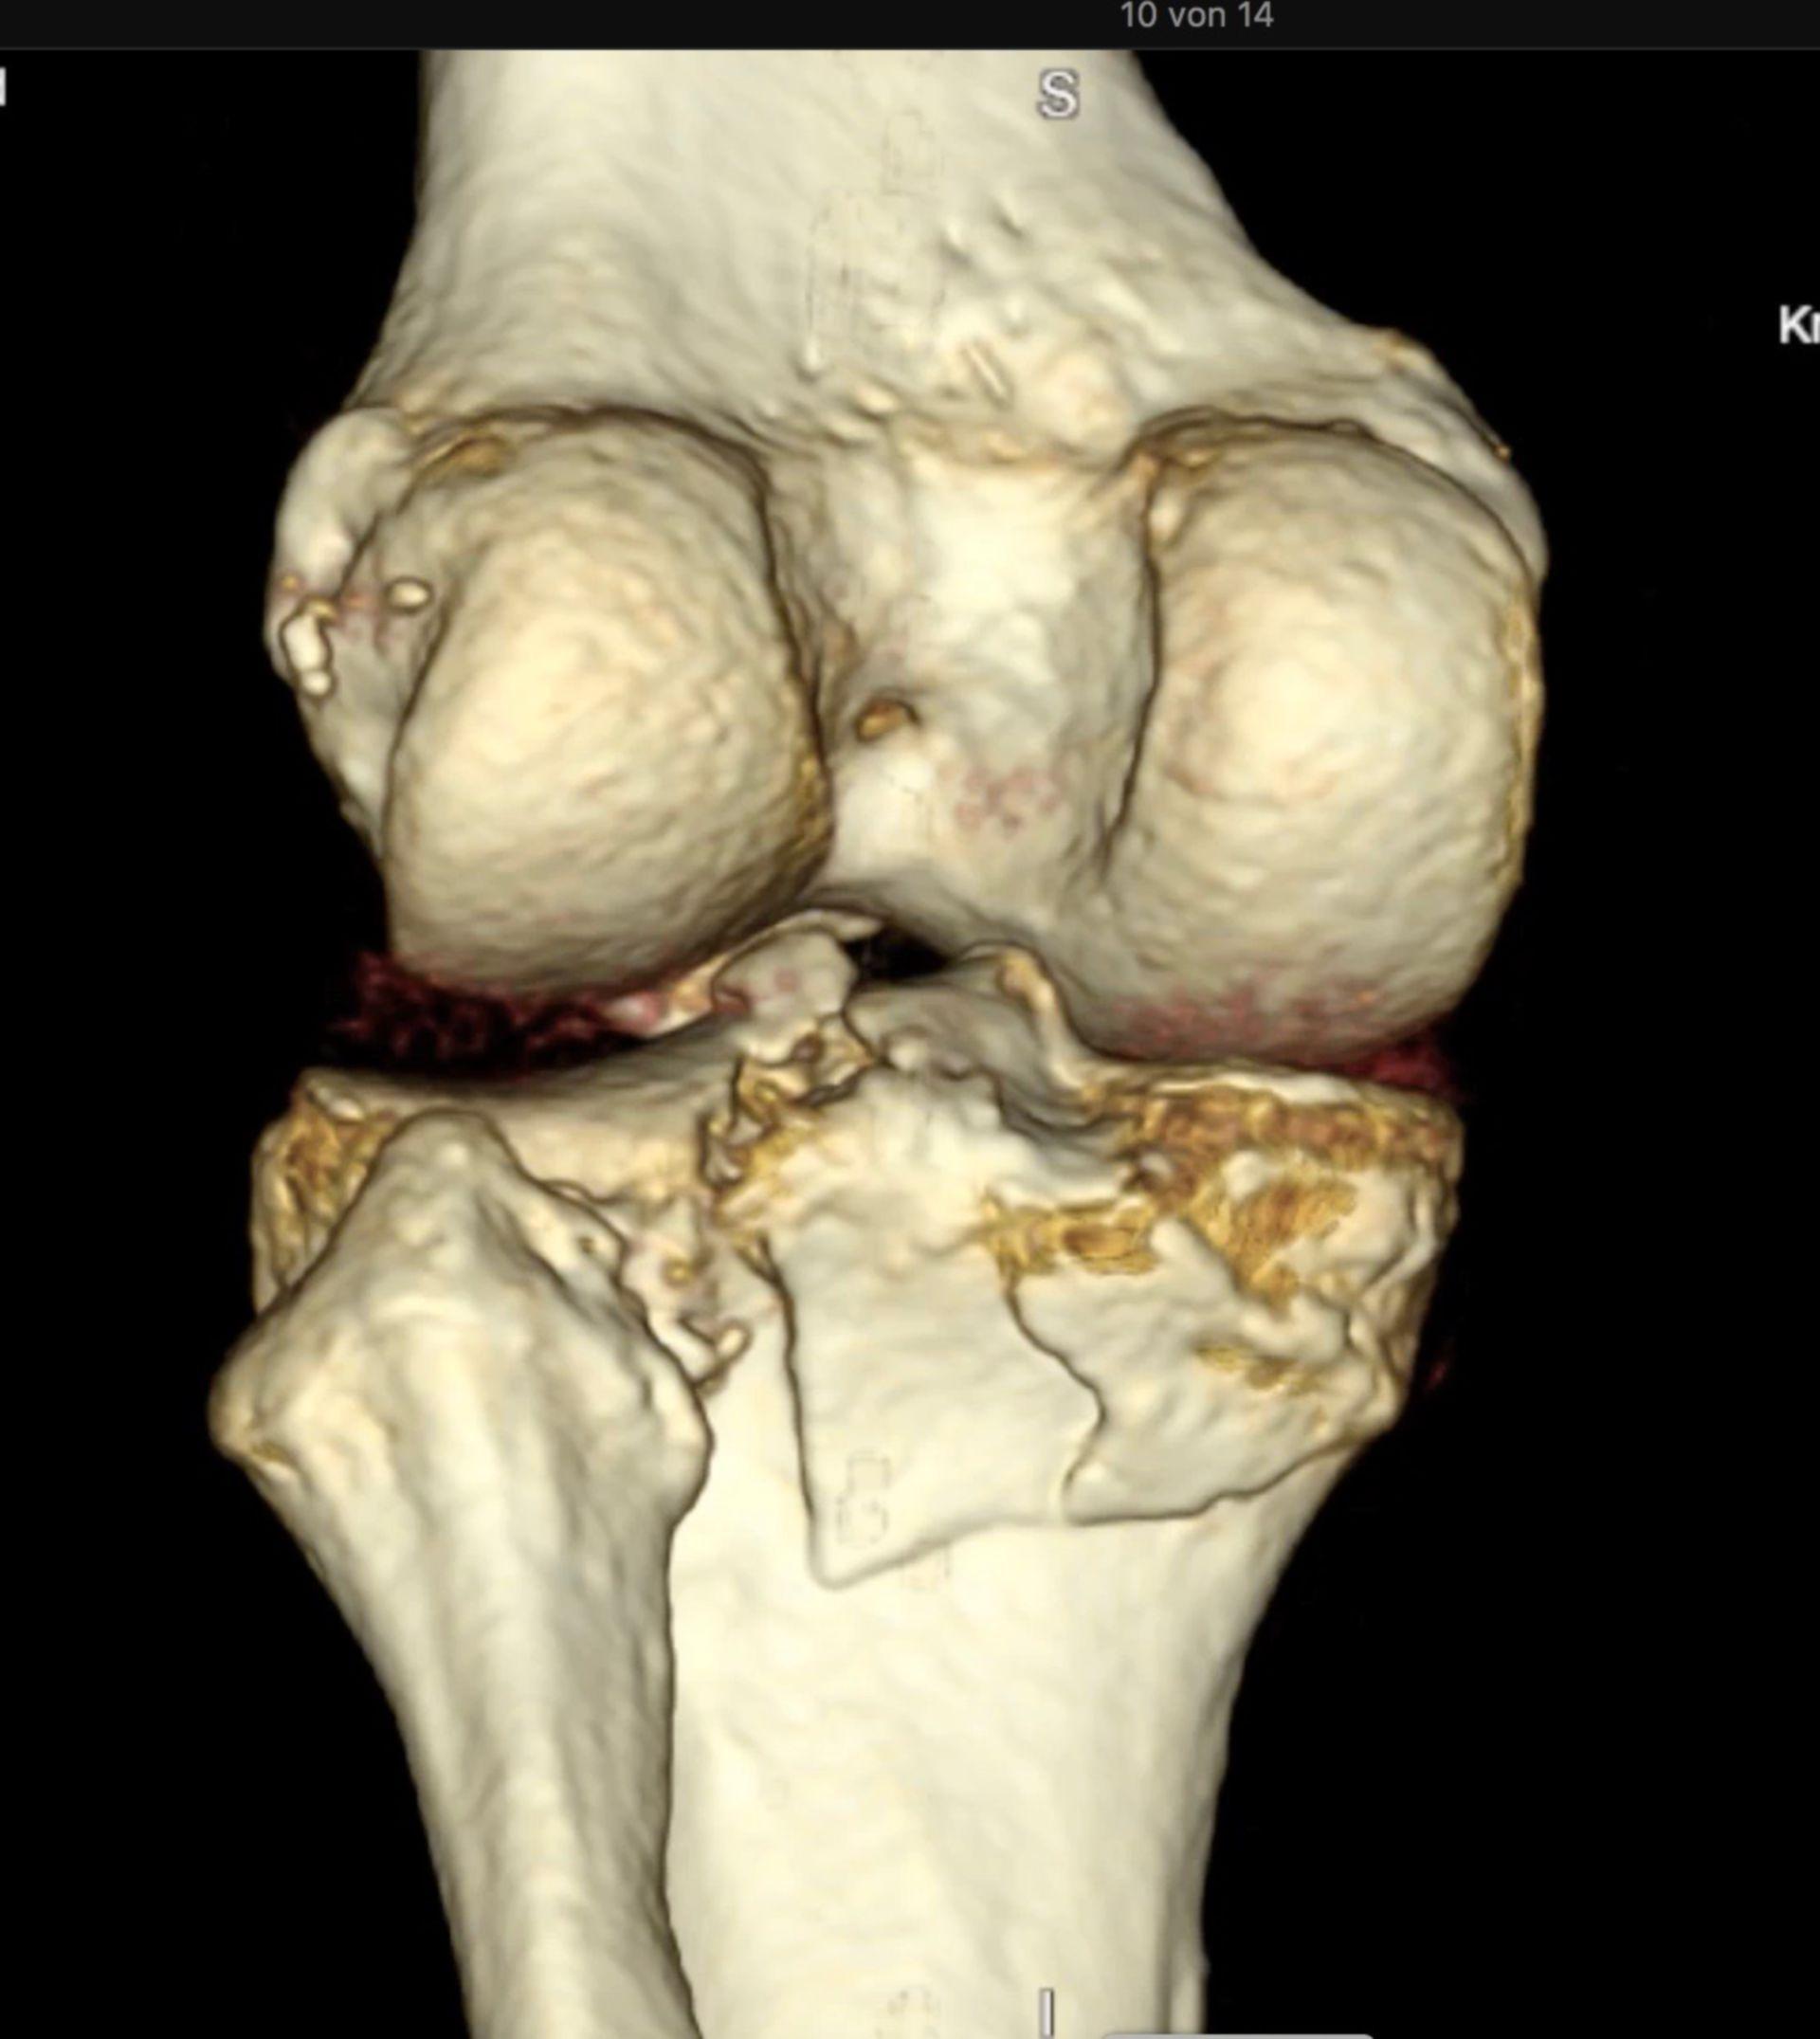 3D-Rekonstruktion des Kniegelenkes bei Tibiakopffraktur